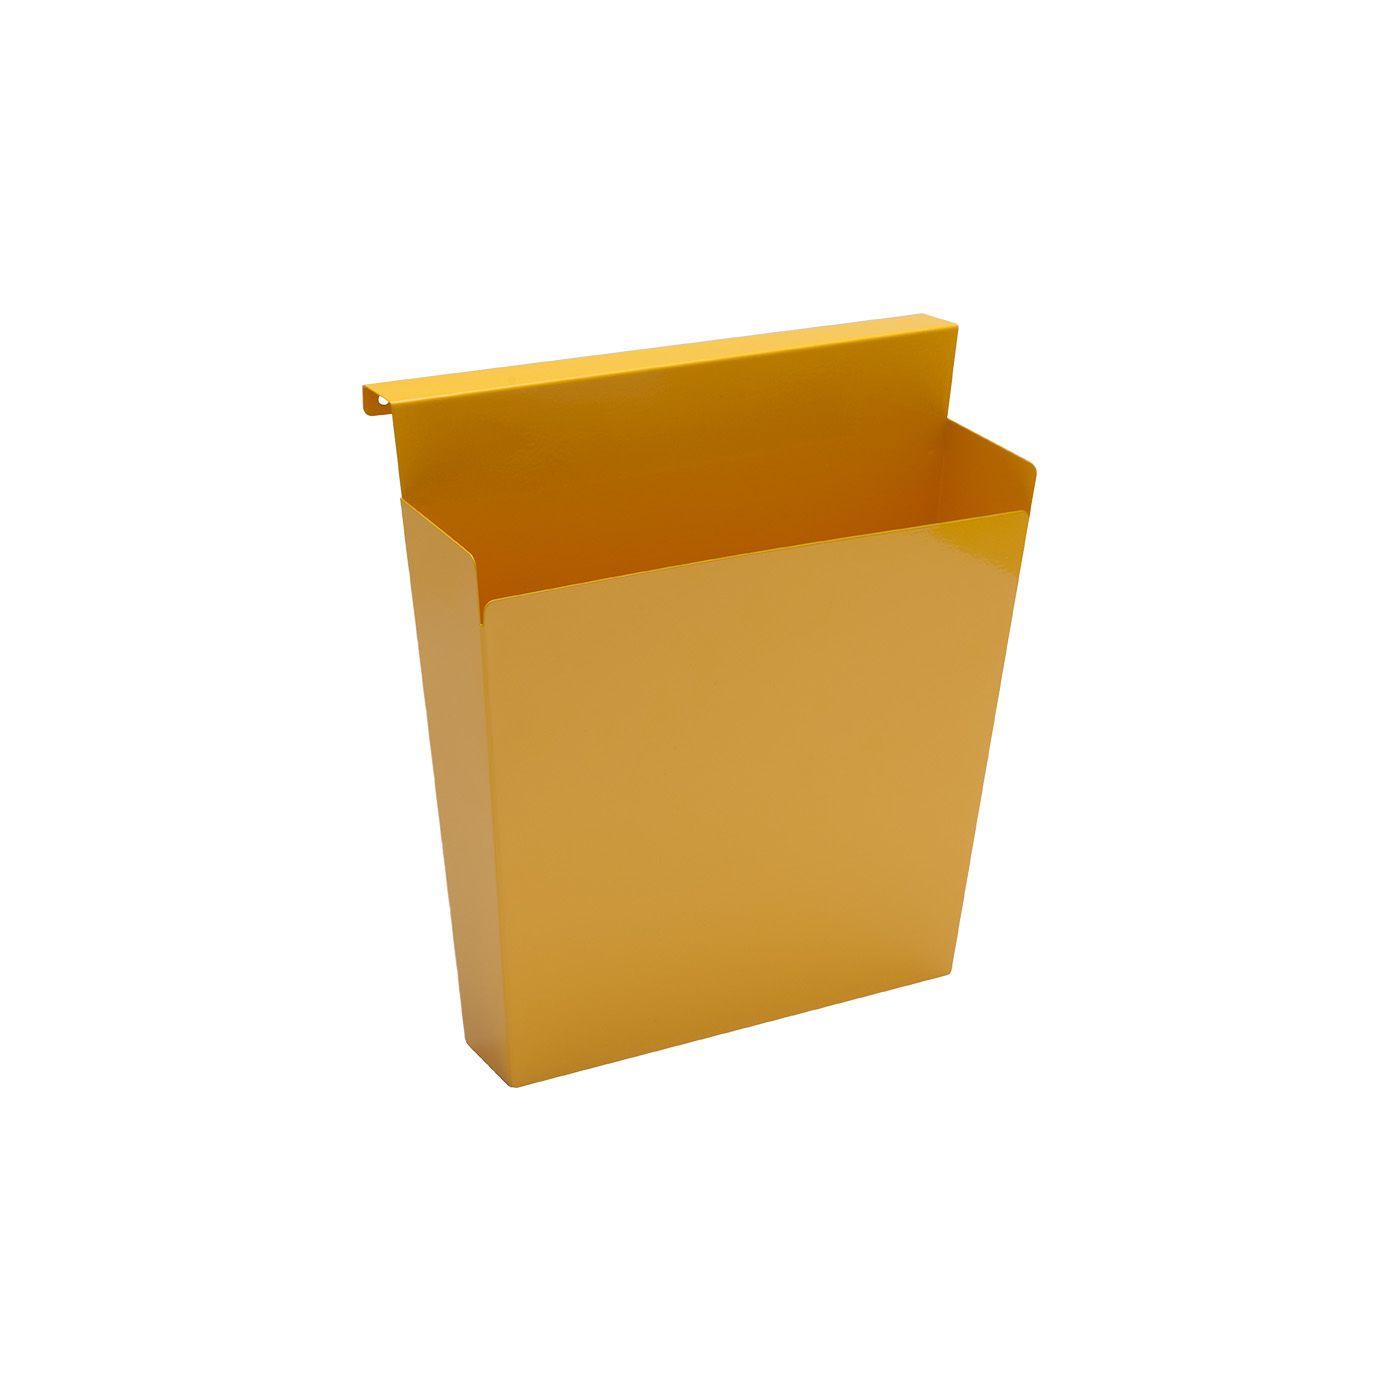 Organizador Linha Neo Porta Papel - Masutti Copat